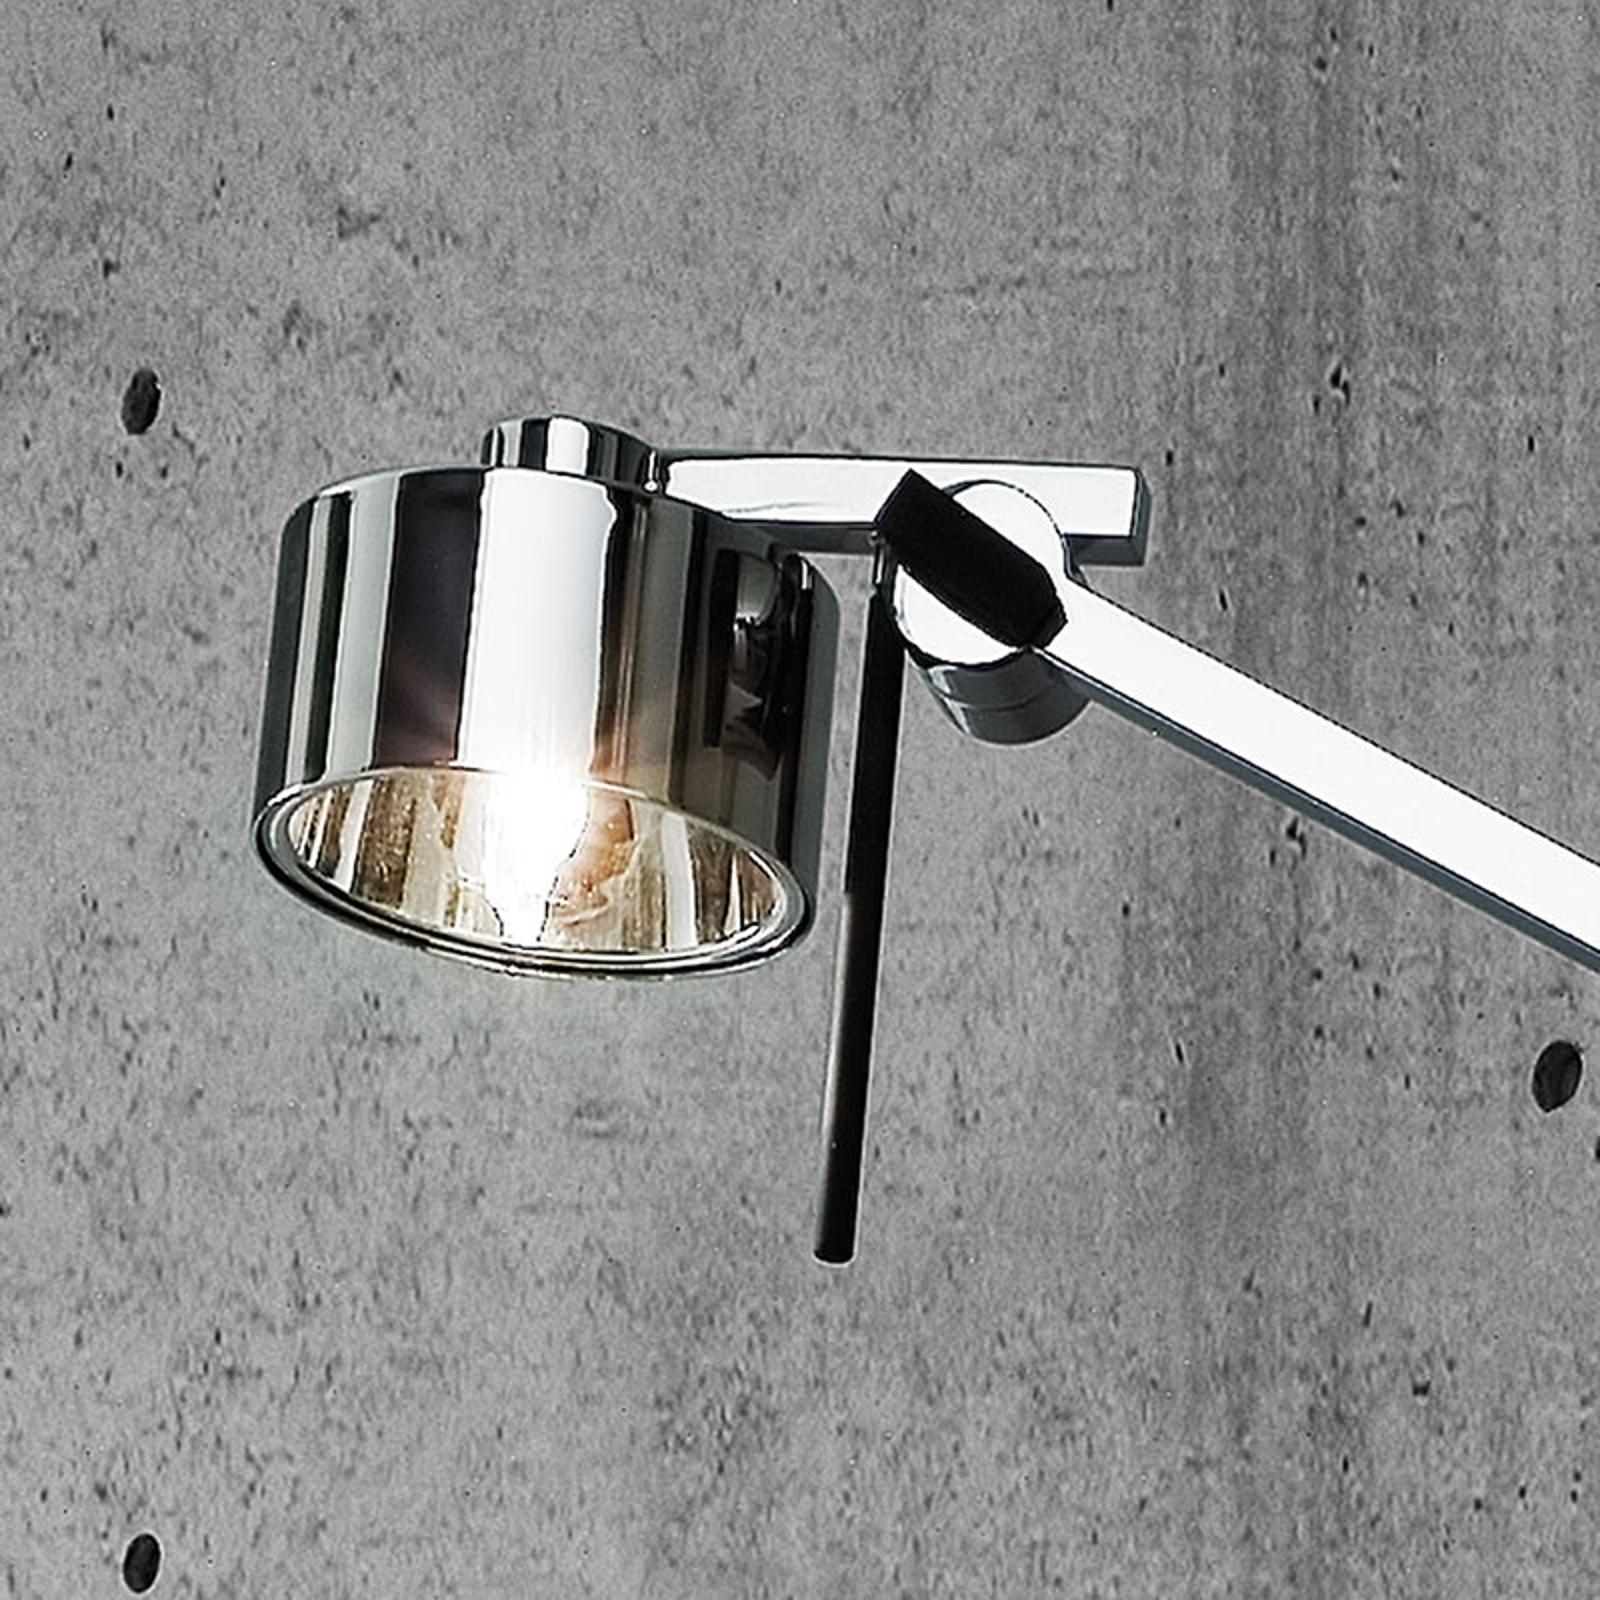 Verchroomde vloerlamp AX20 met dimmer